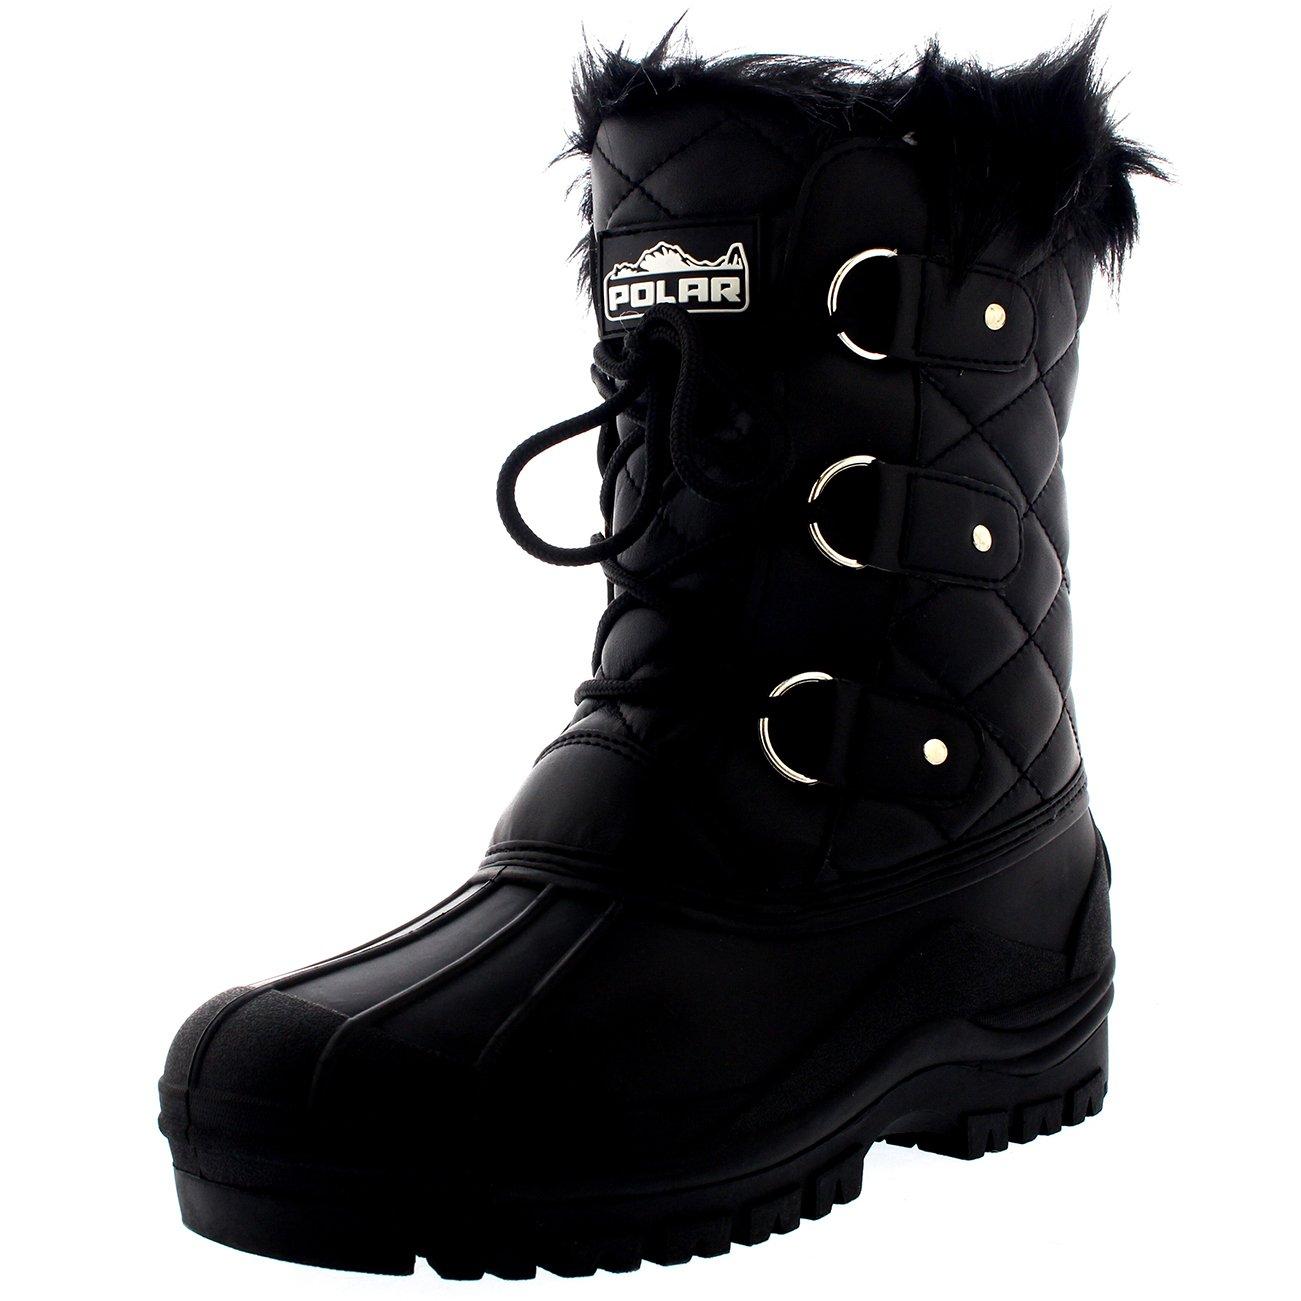 Polar Womens Mid Calf Mountain Walking Tactical Waterproof Boots